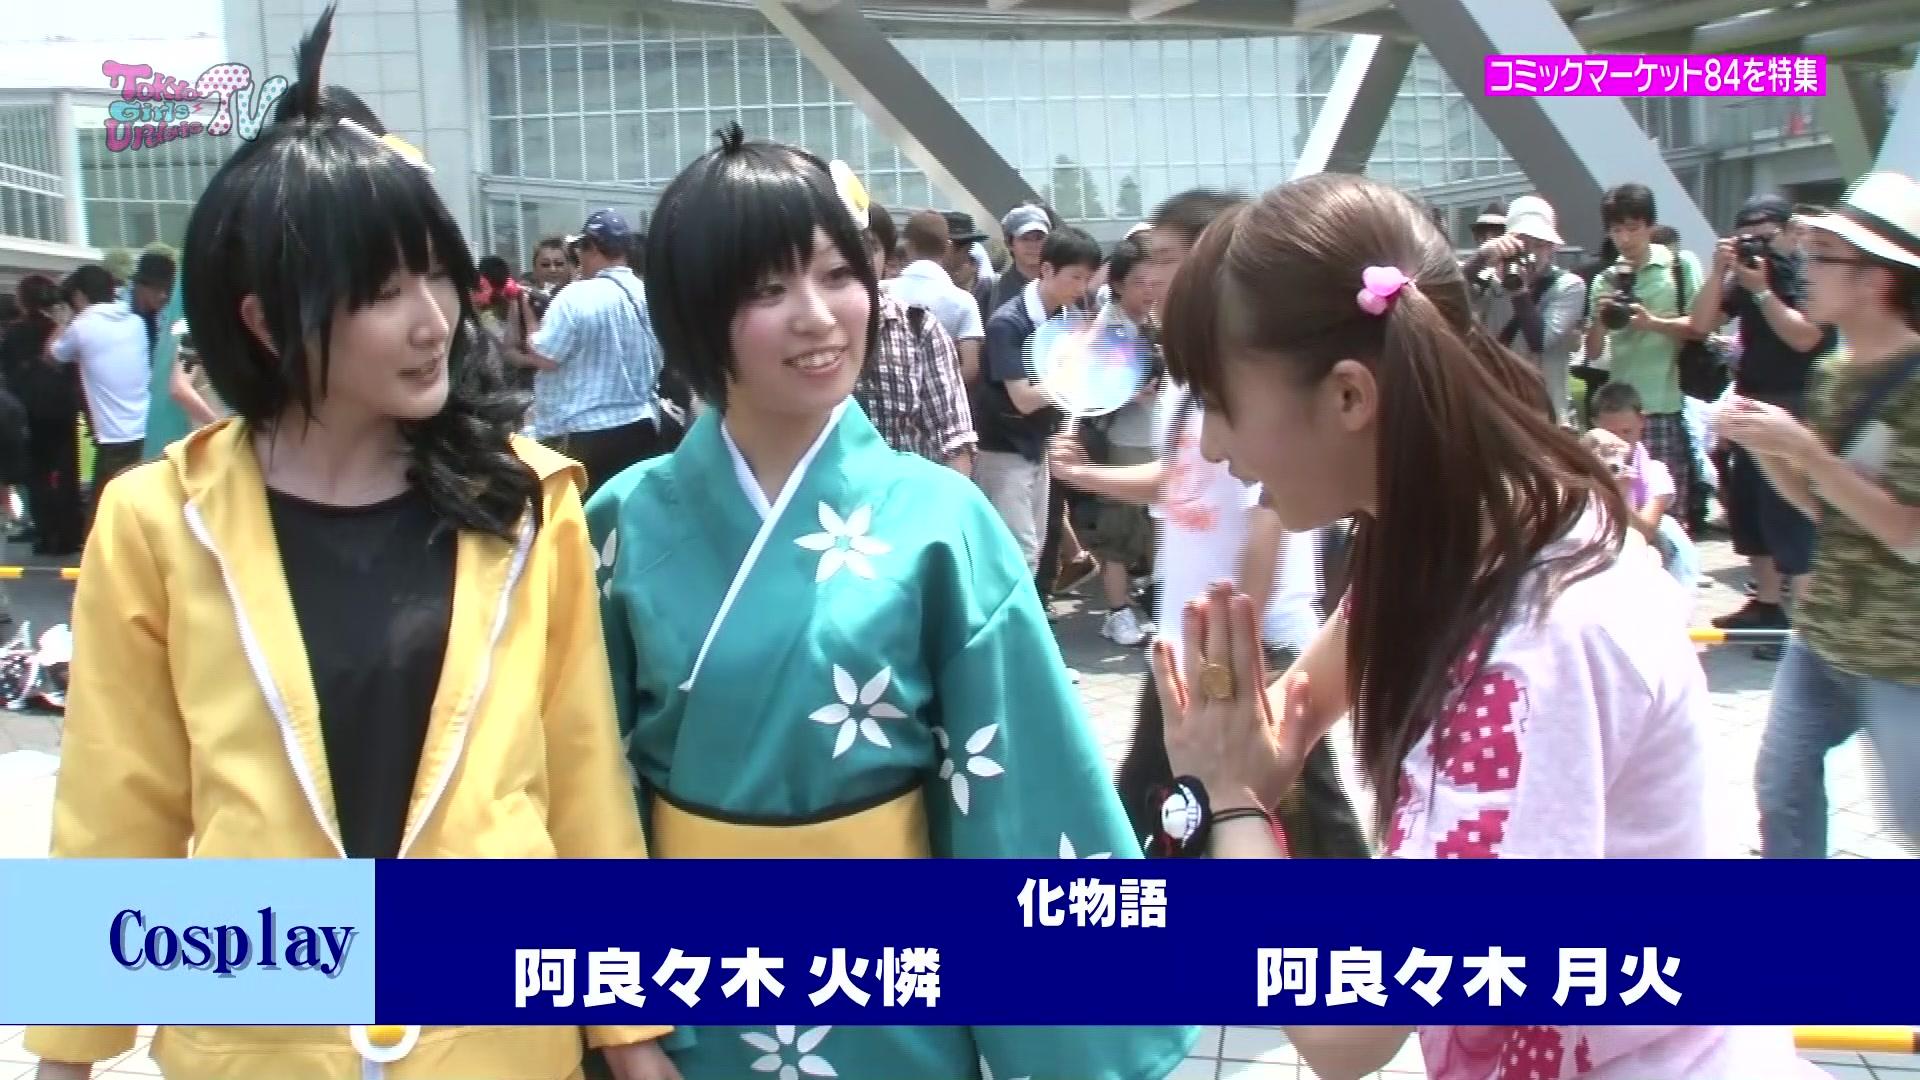 Tokyo Girls Update Episode 2